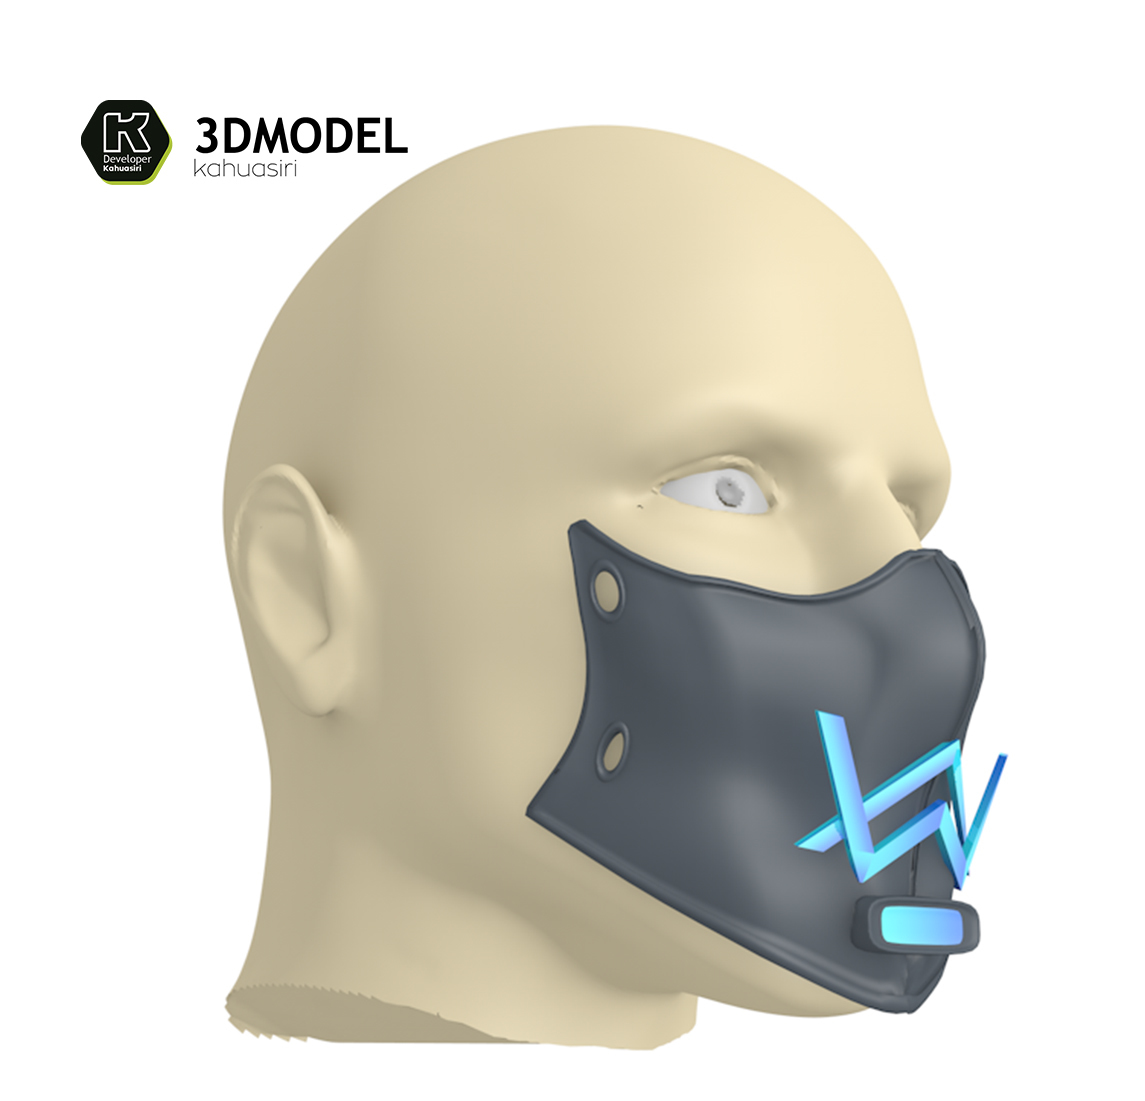 4.jpg Download free 3DS file Alan Walker Coronavirus protection mask (COVID-19) MOD 1 #3DvsCOVID19 • 3D printer object, ronaldocc13